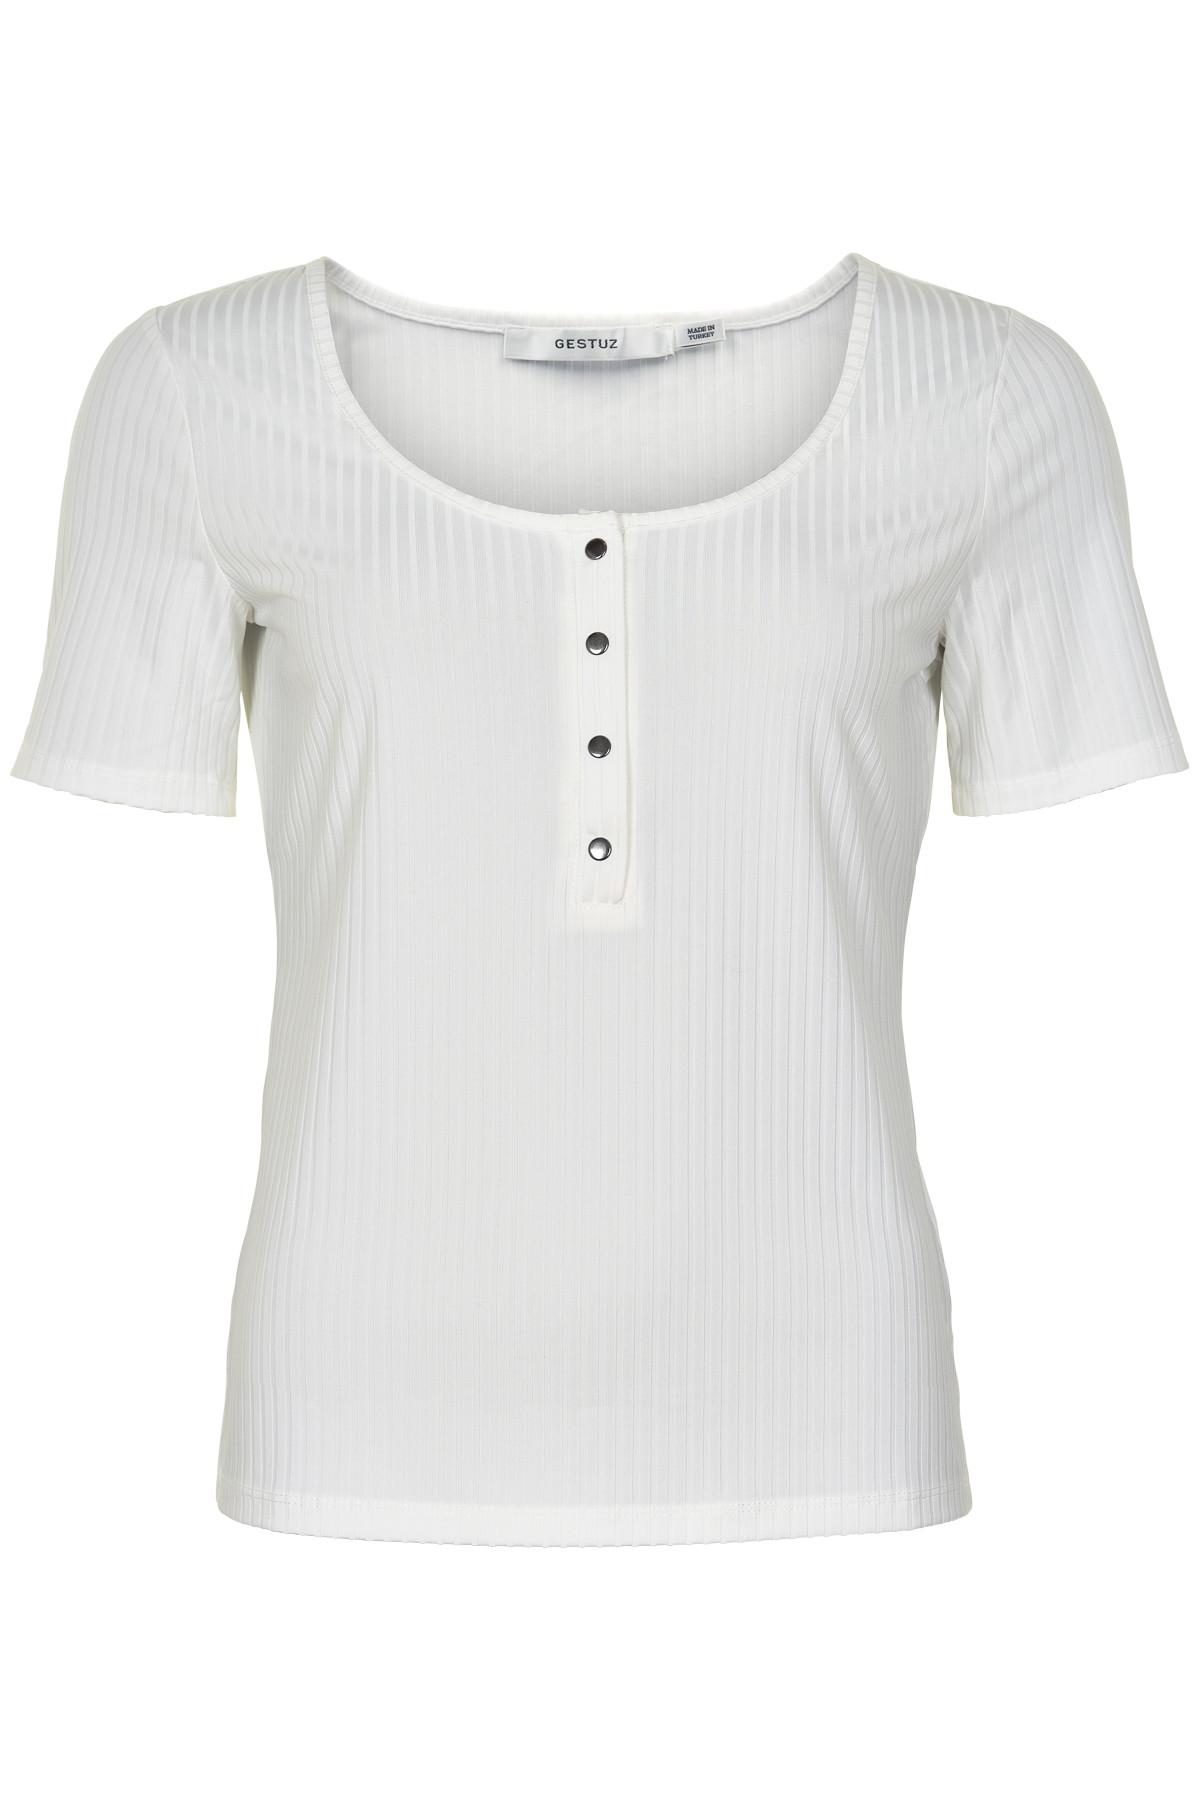 Image of   GESTUZ ROLLOGZ T-SHIRT B (Bright White 90014, L)